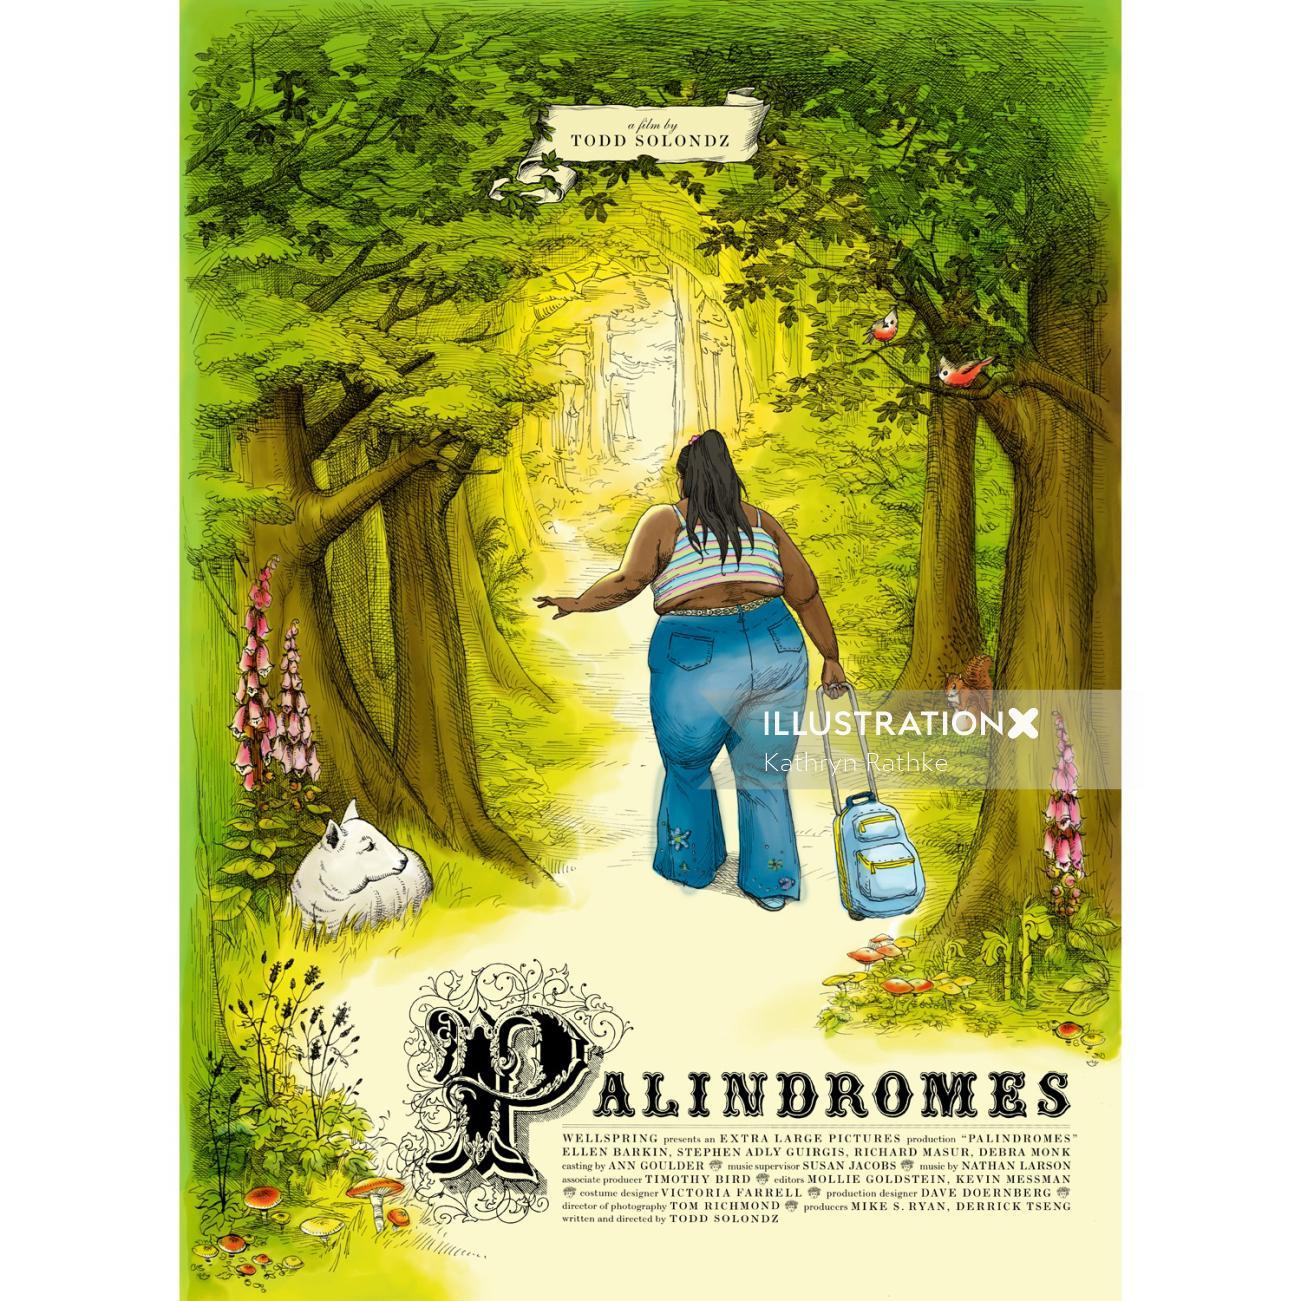 Palindromes movie poster design